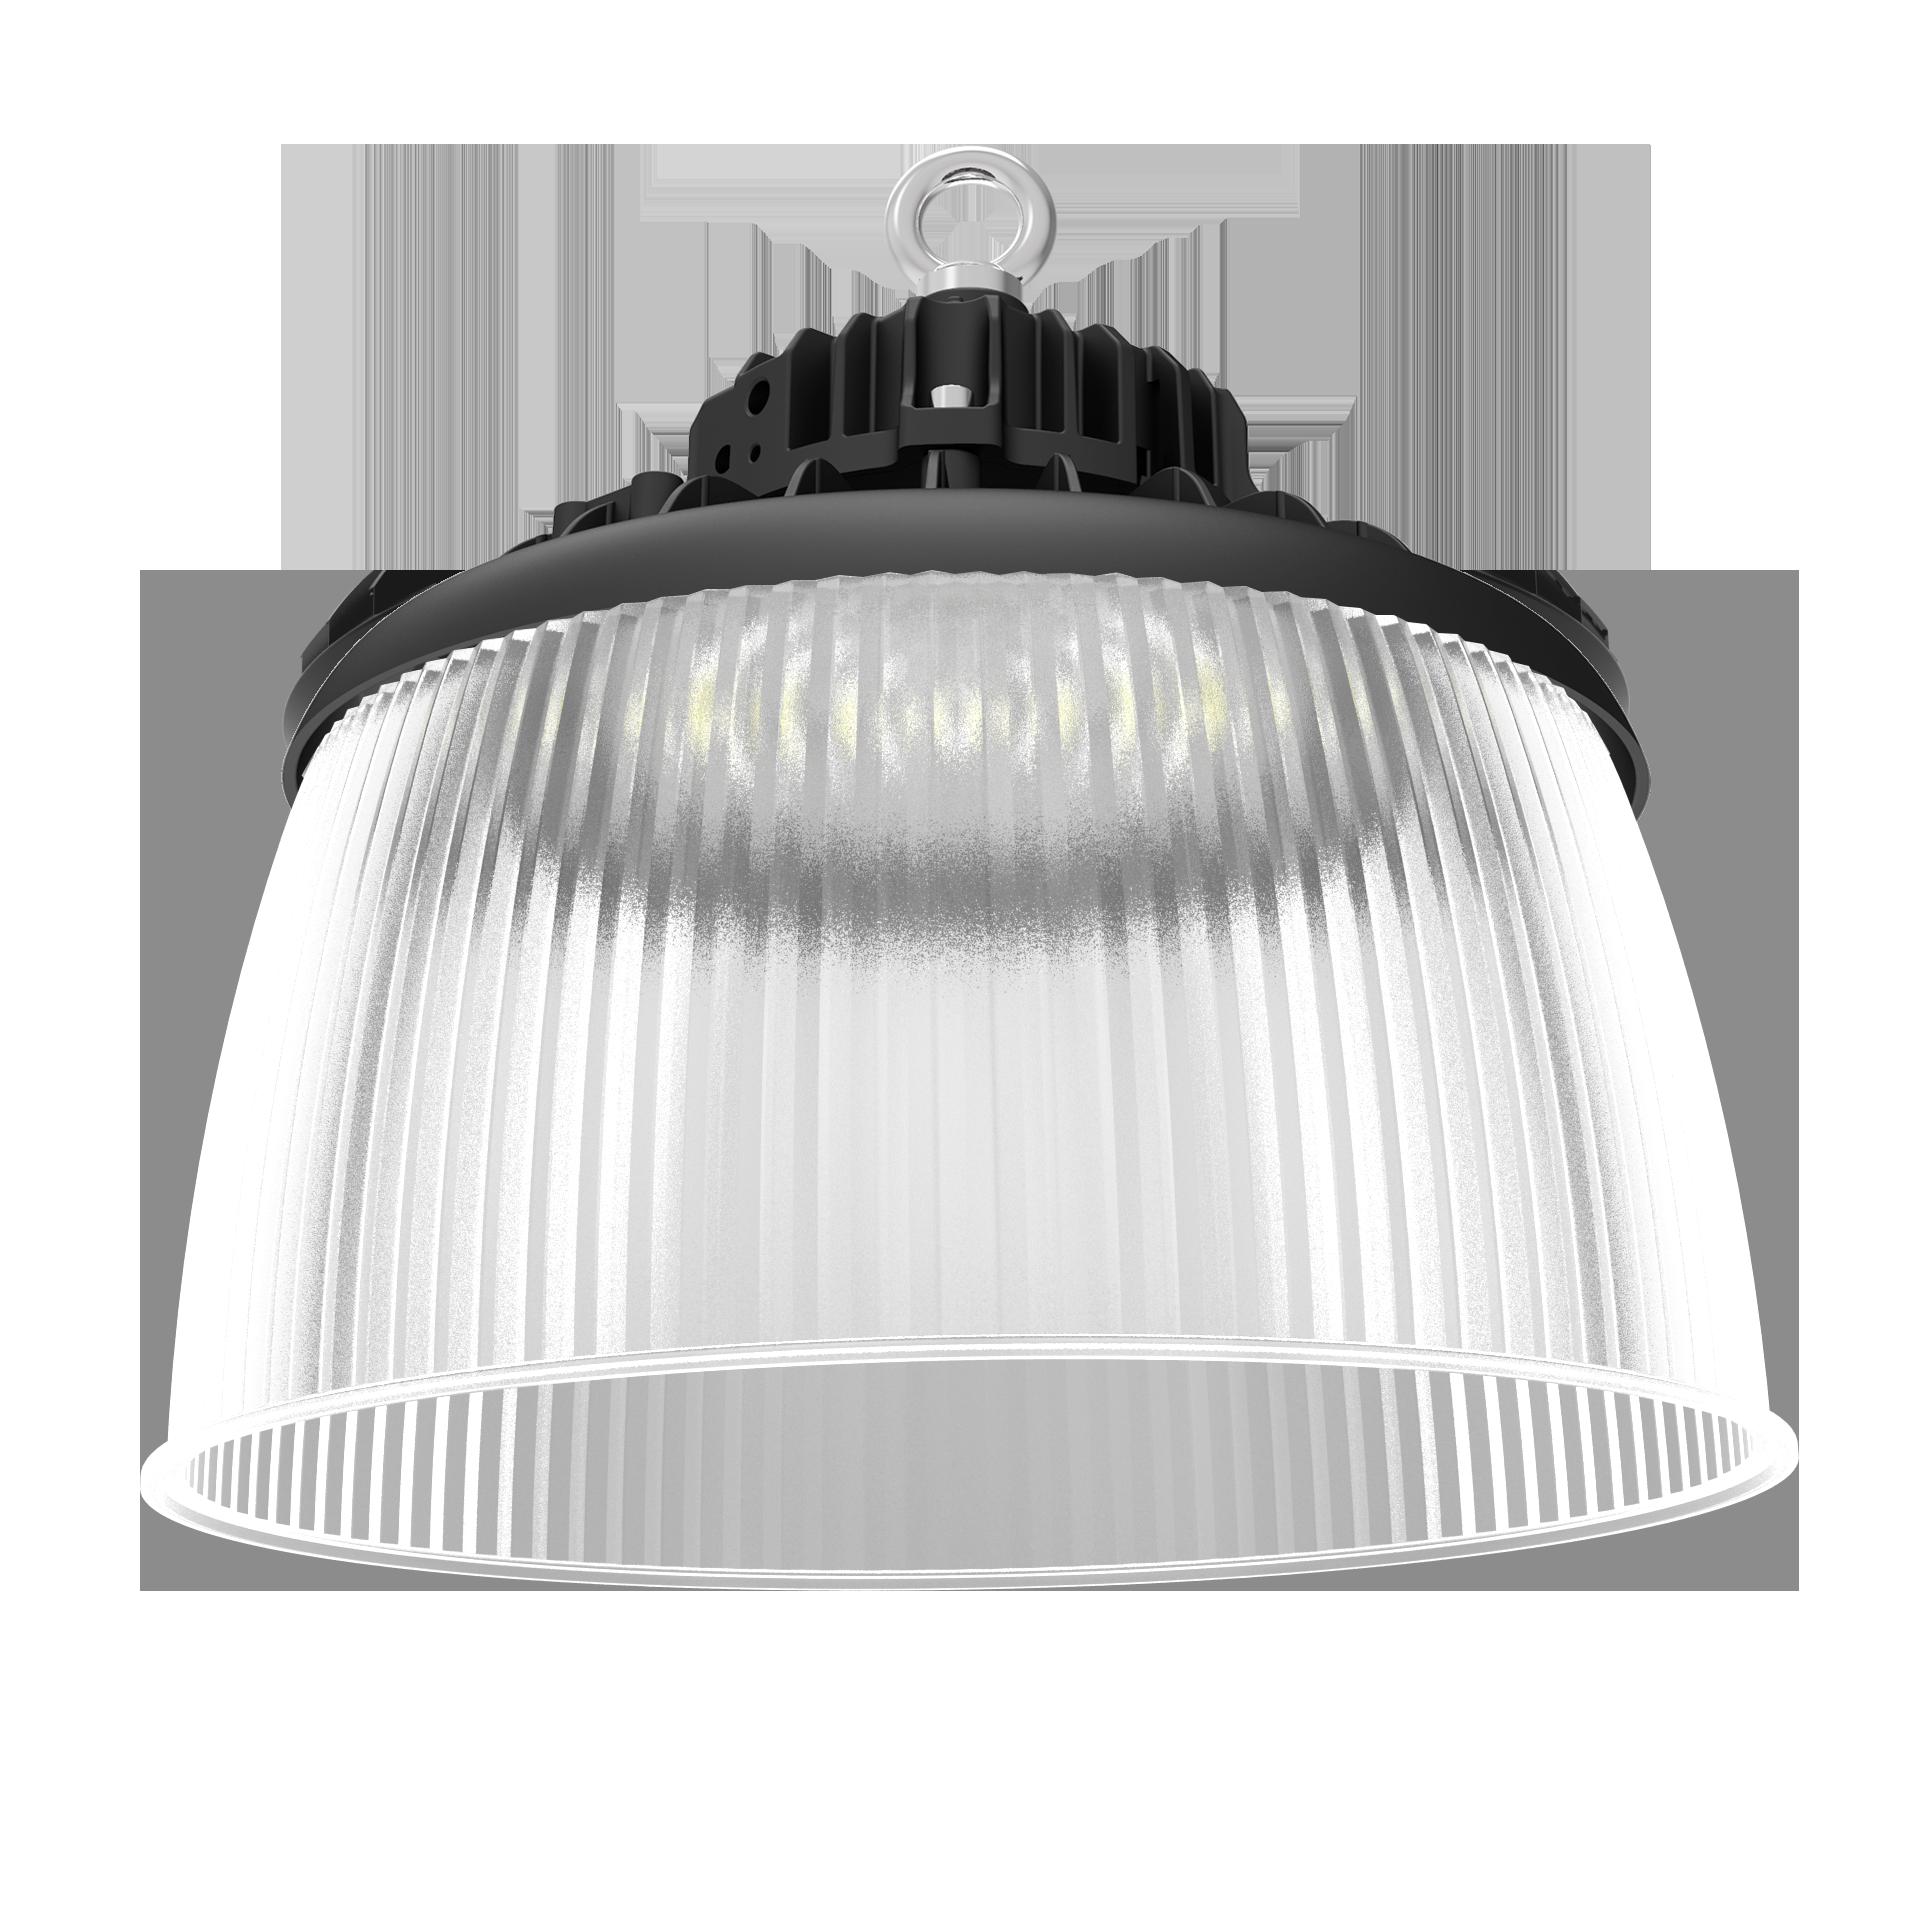 product-SEEKING-HBD High Bay Light-img